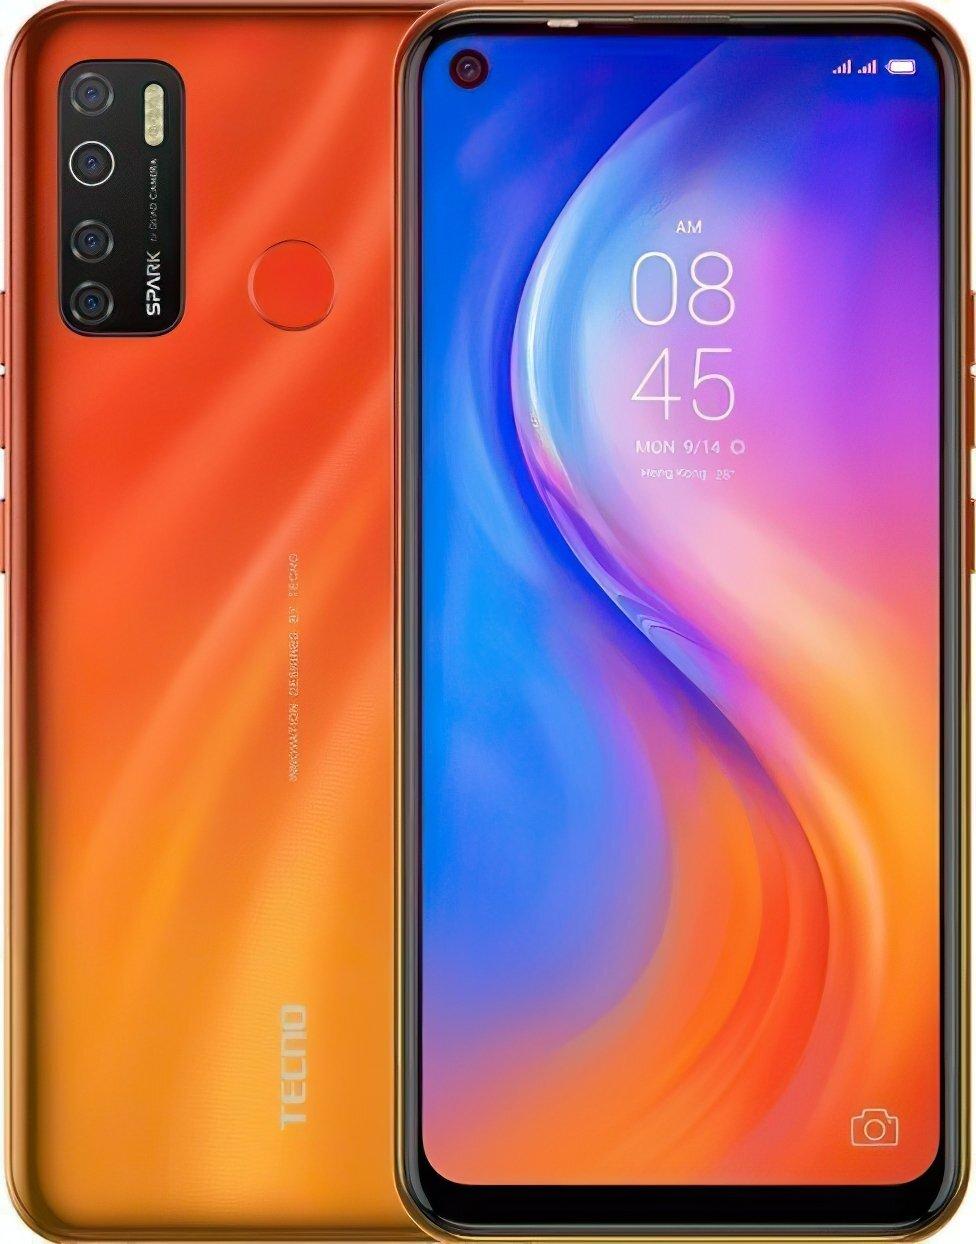 Смартфон TECNO Spark 5 Pro (KD7) 4/64Gb DS Spark Orangeфото